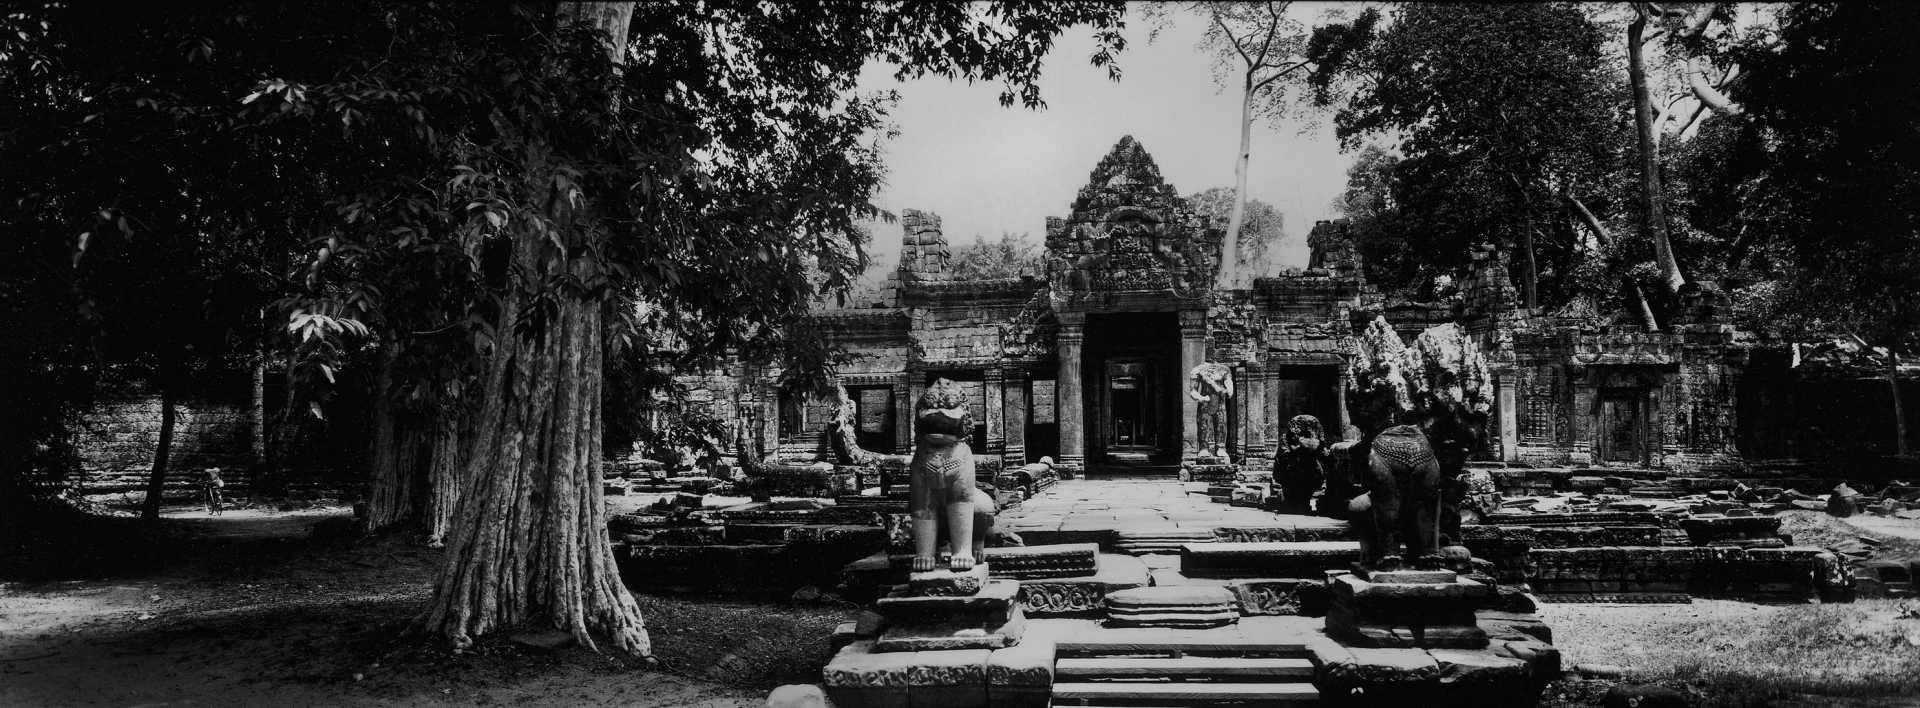 Siem Reap ruins, Cambodia.